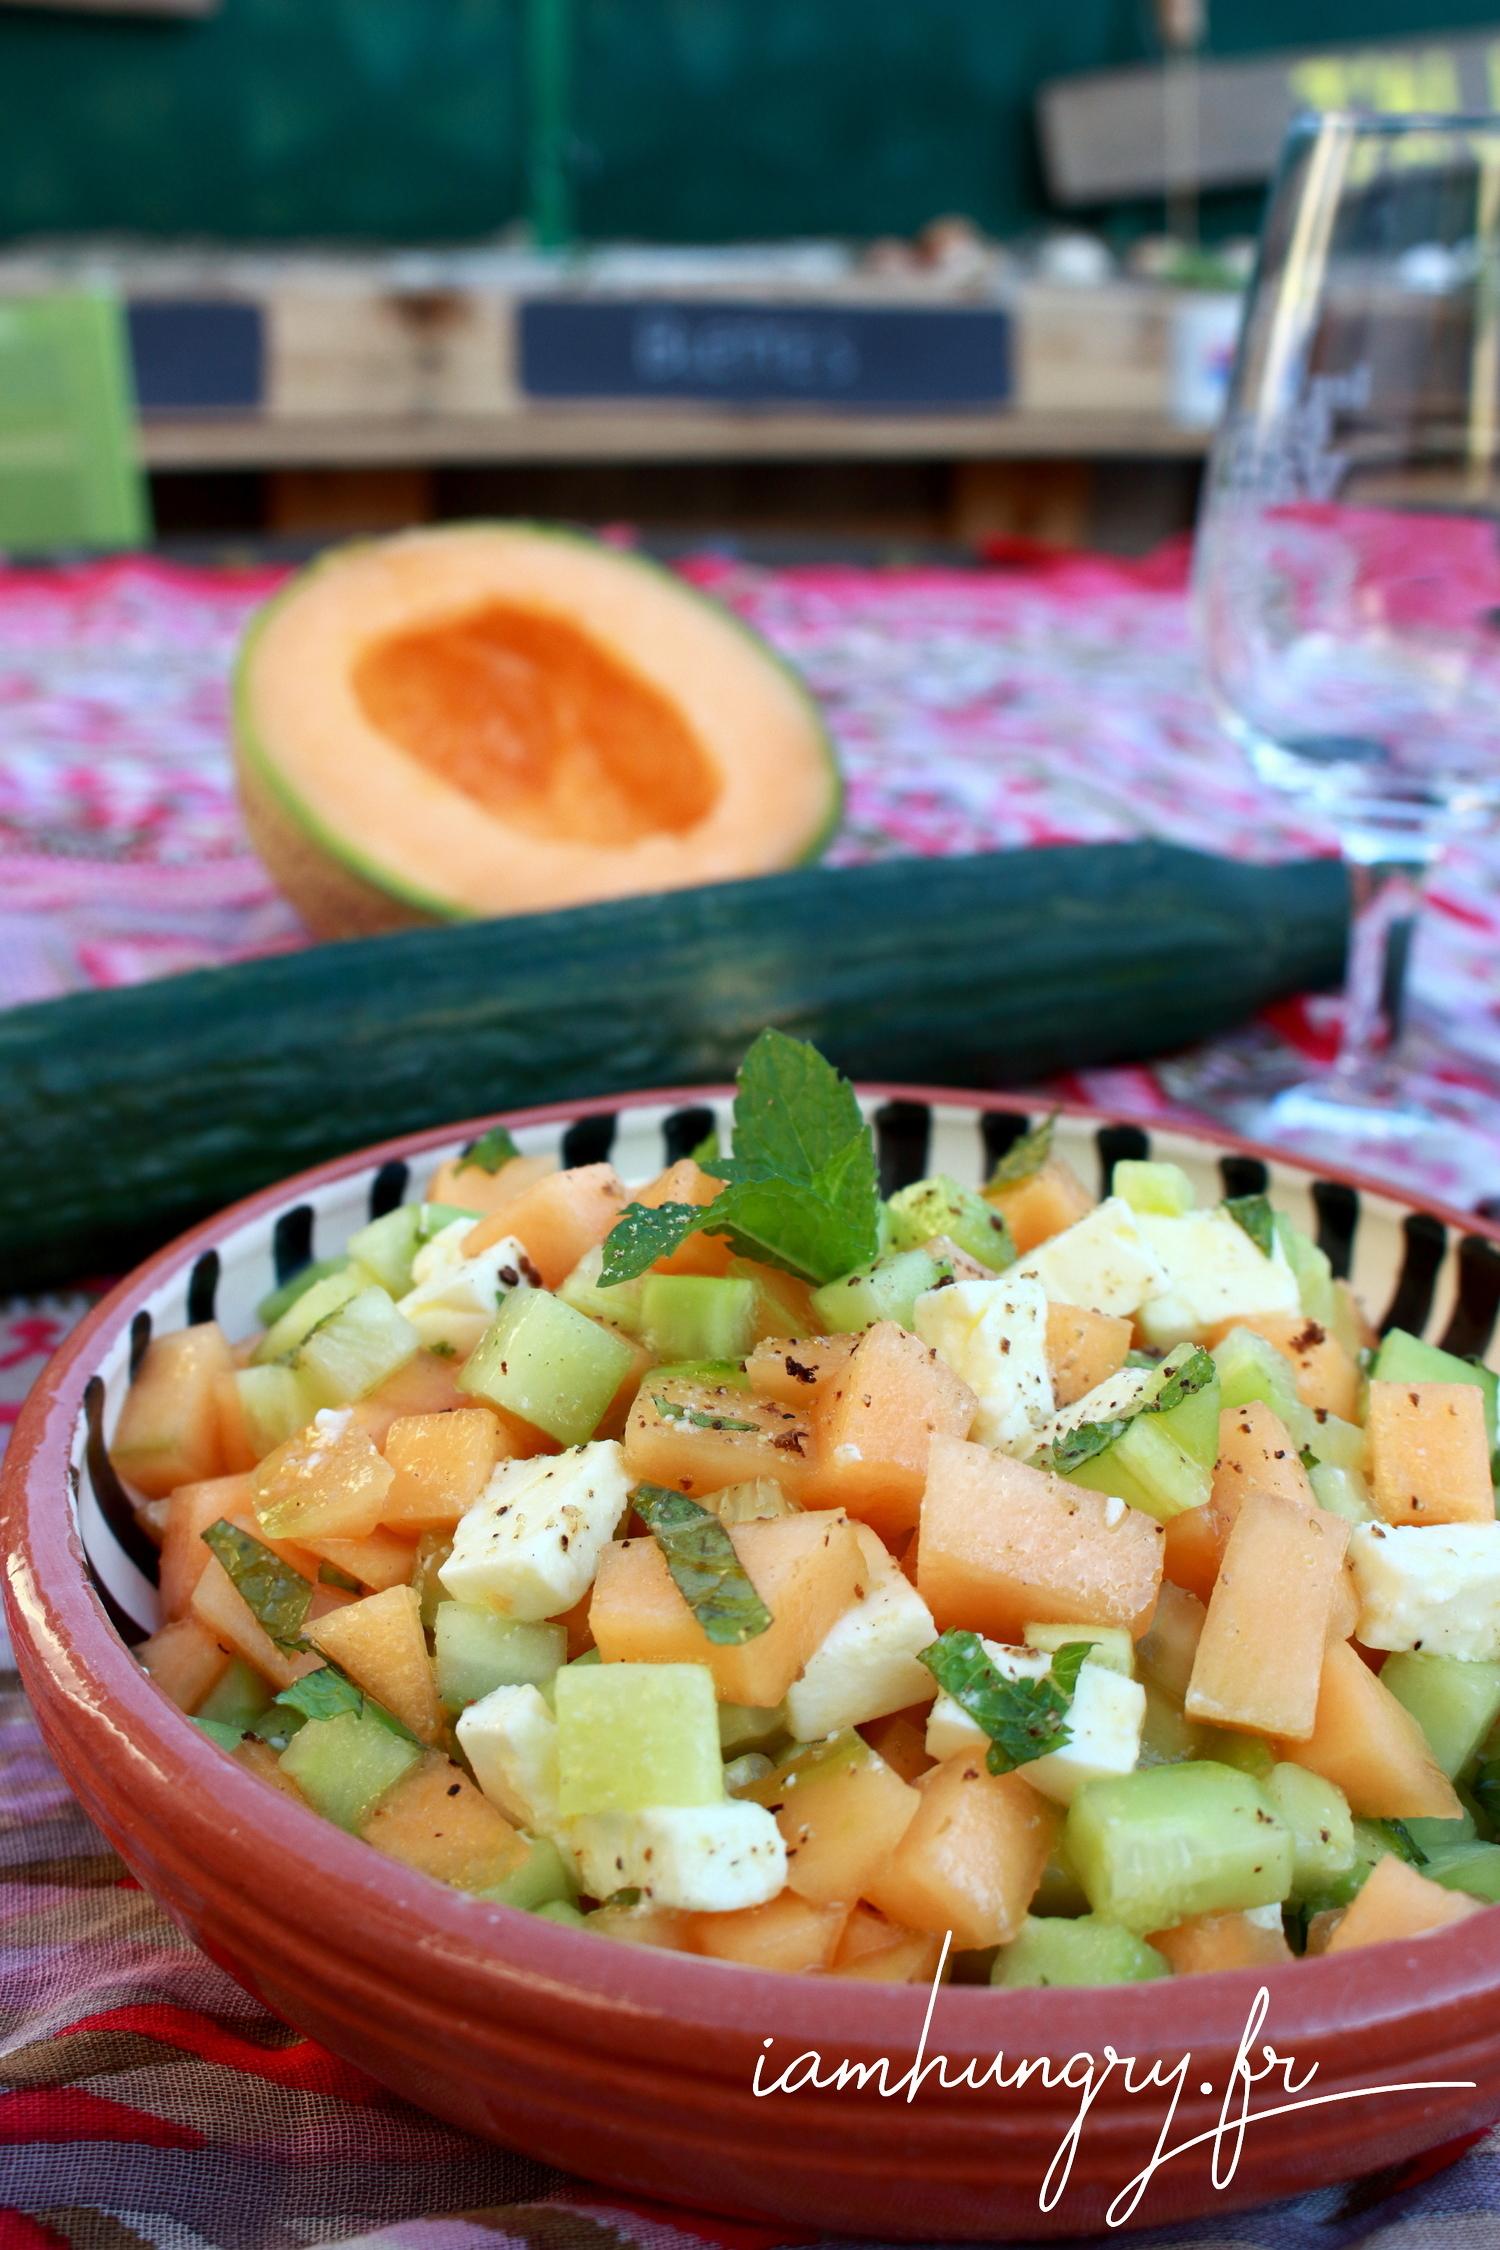 Salade de melon concombre et féta